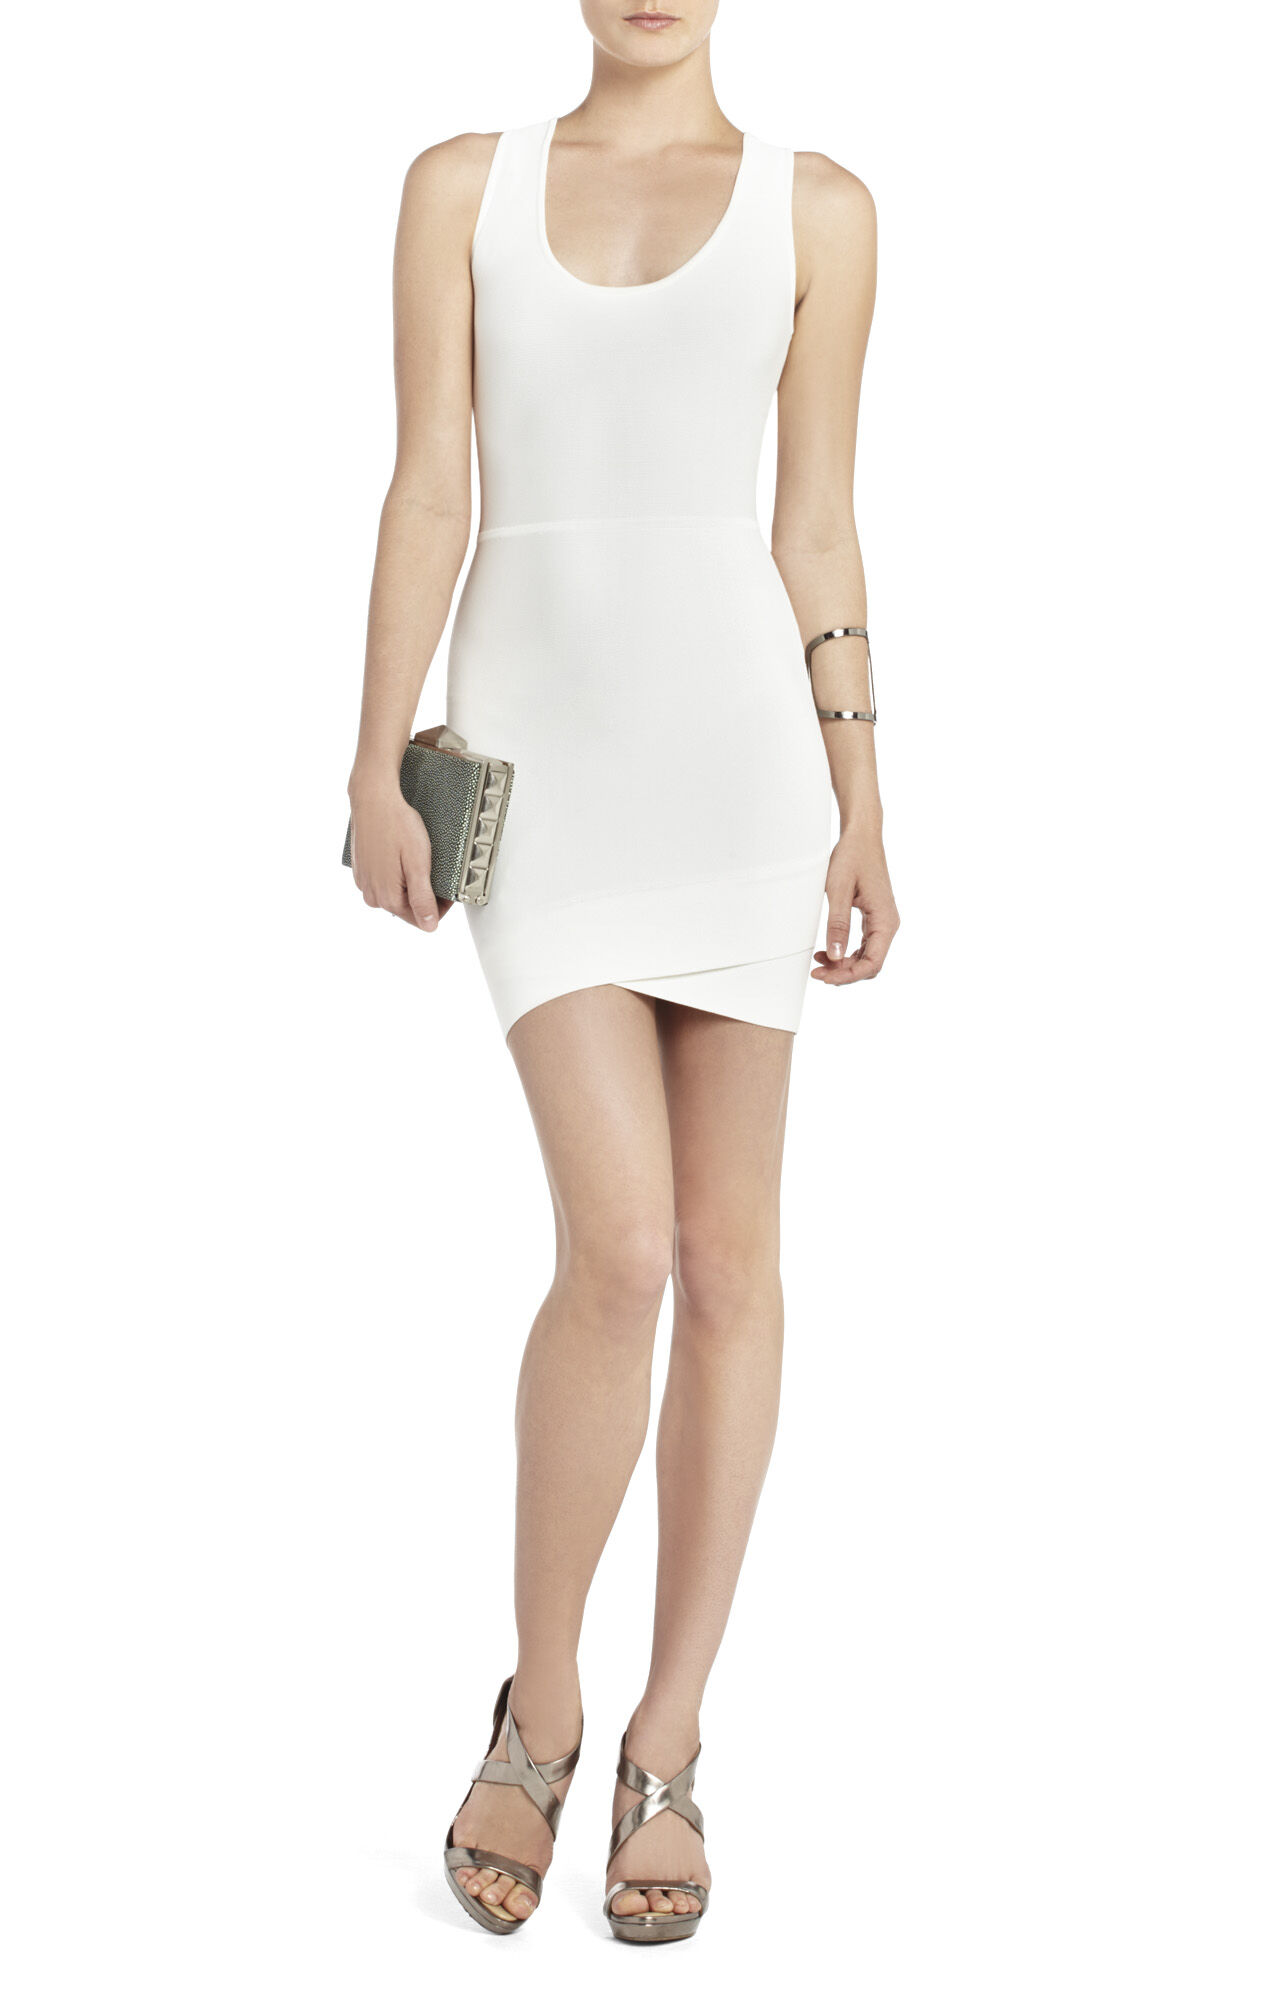 Gisela Cocktail Dress